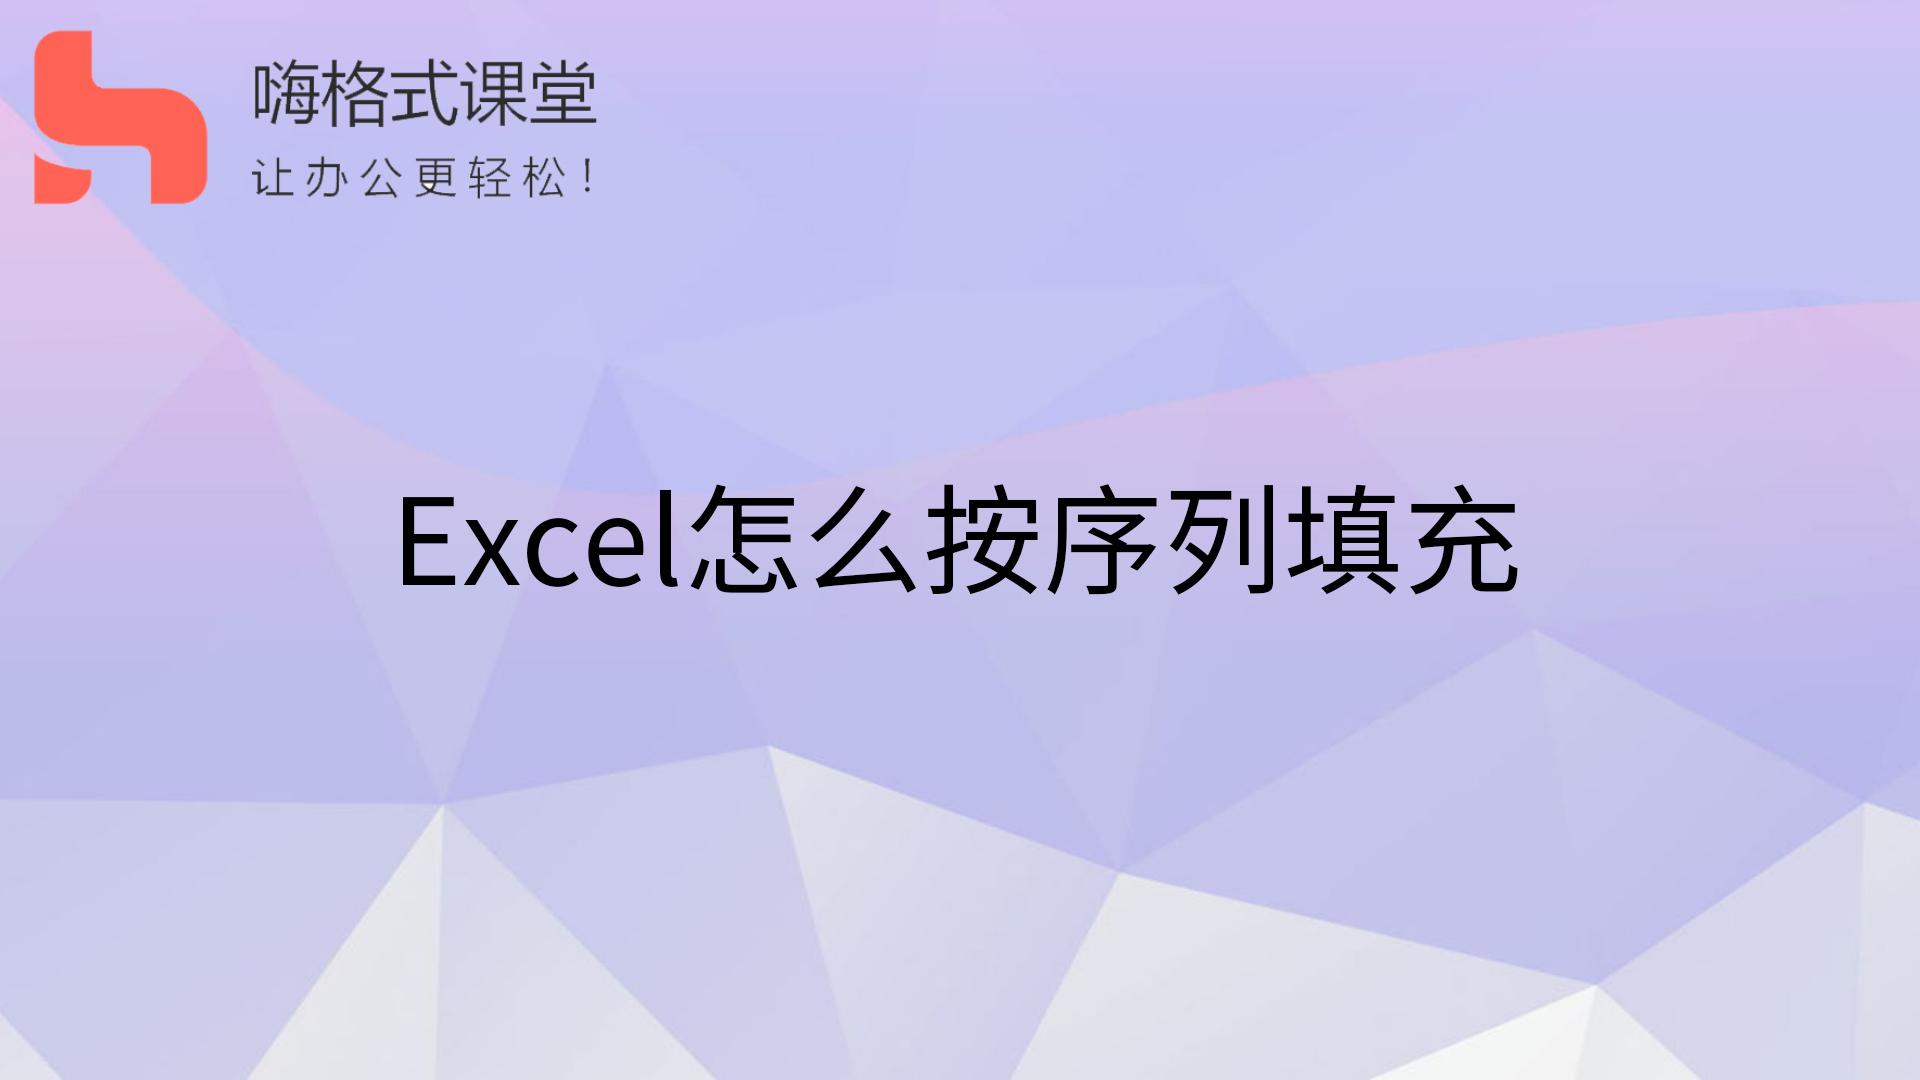 Excel怎么按序列填充